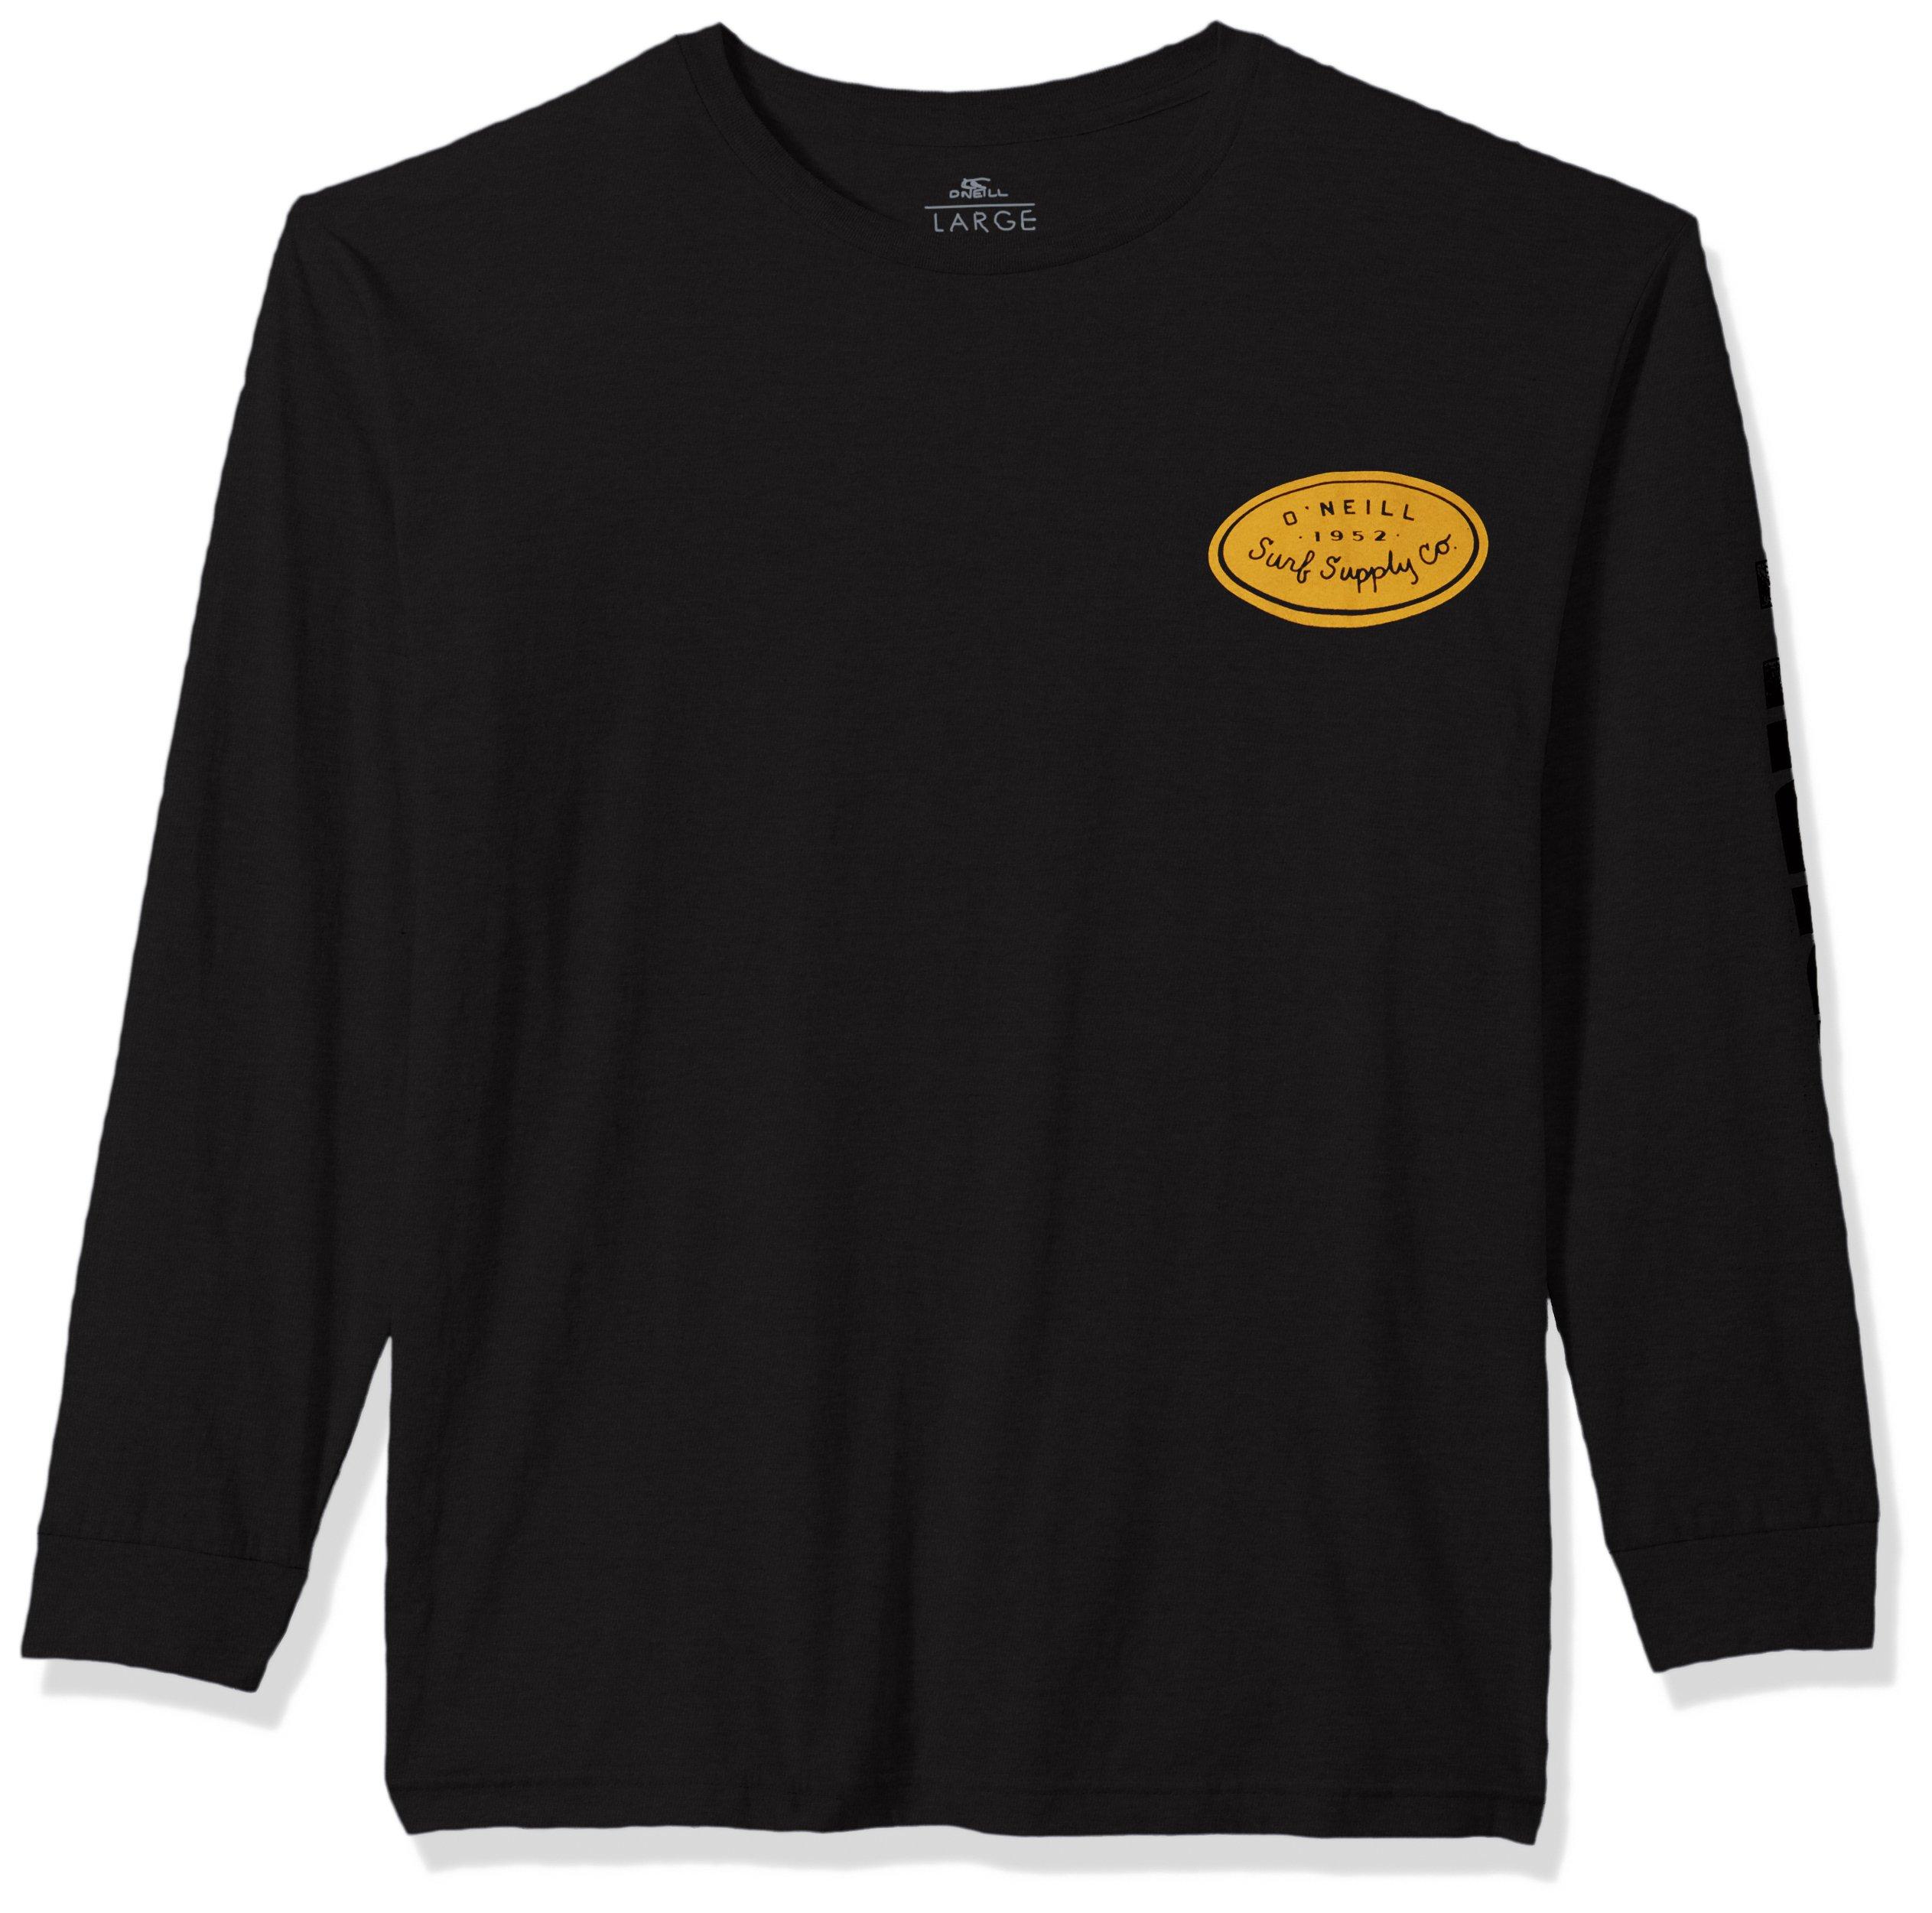 O'Neill Men's Long Sleeve T-Shirt, Saved Black, XXL